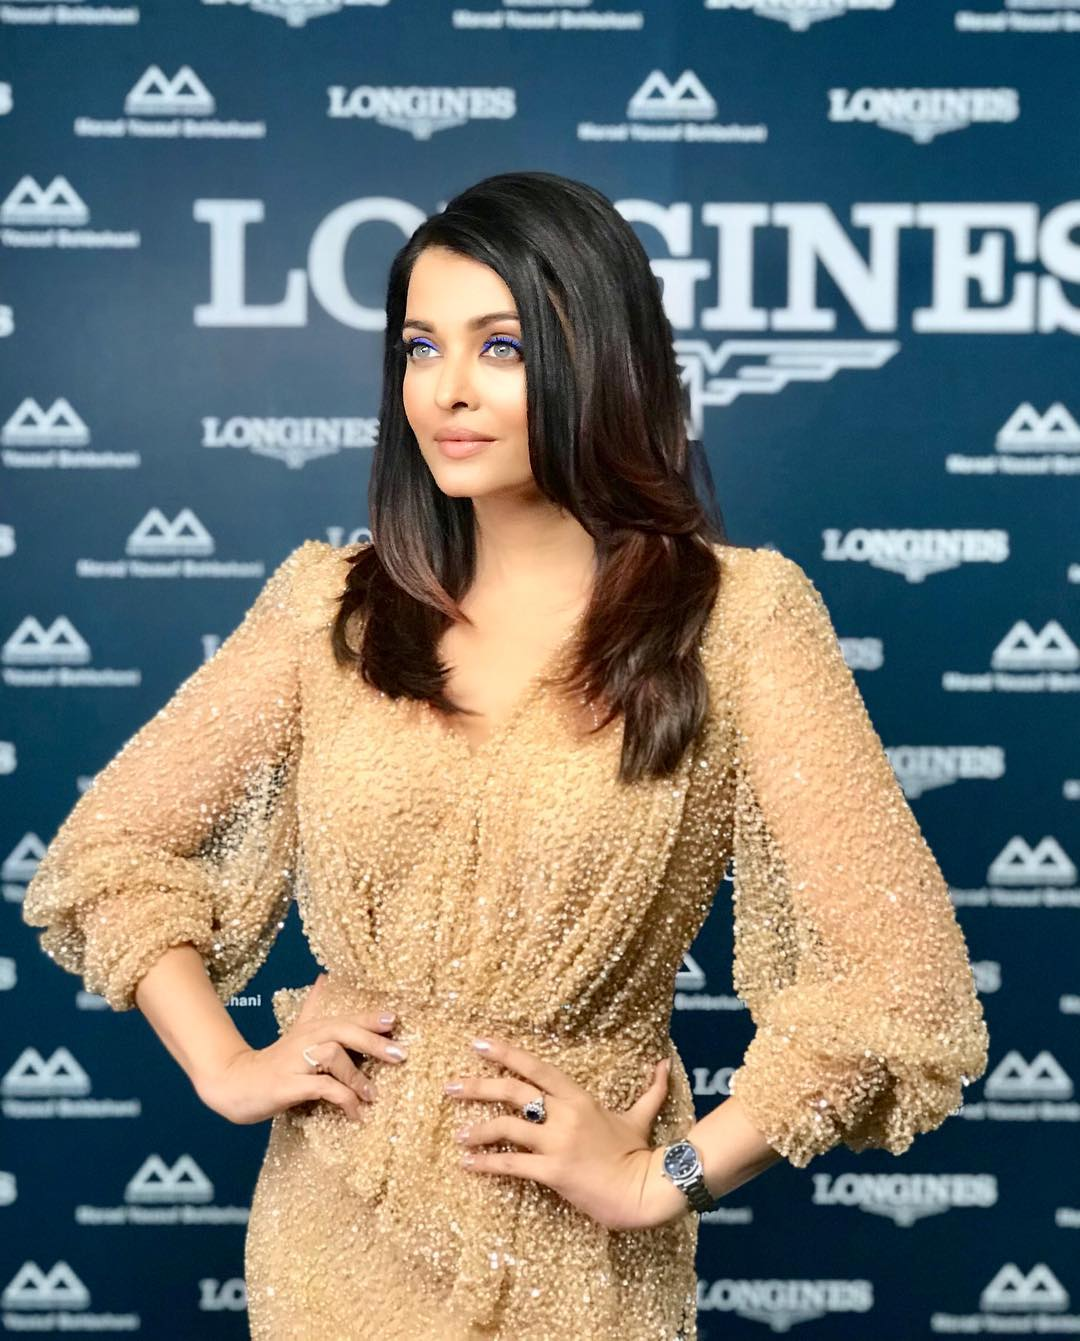 Instagram: Aishwarya Rai Bachchan